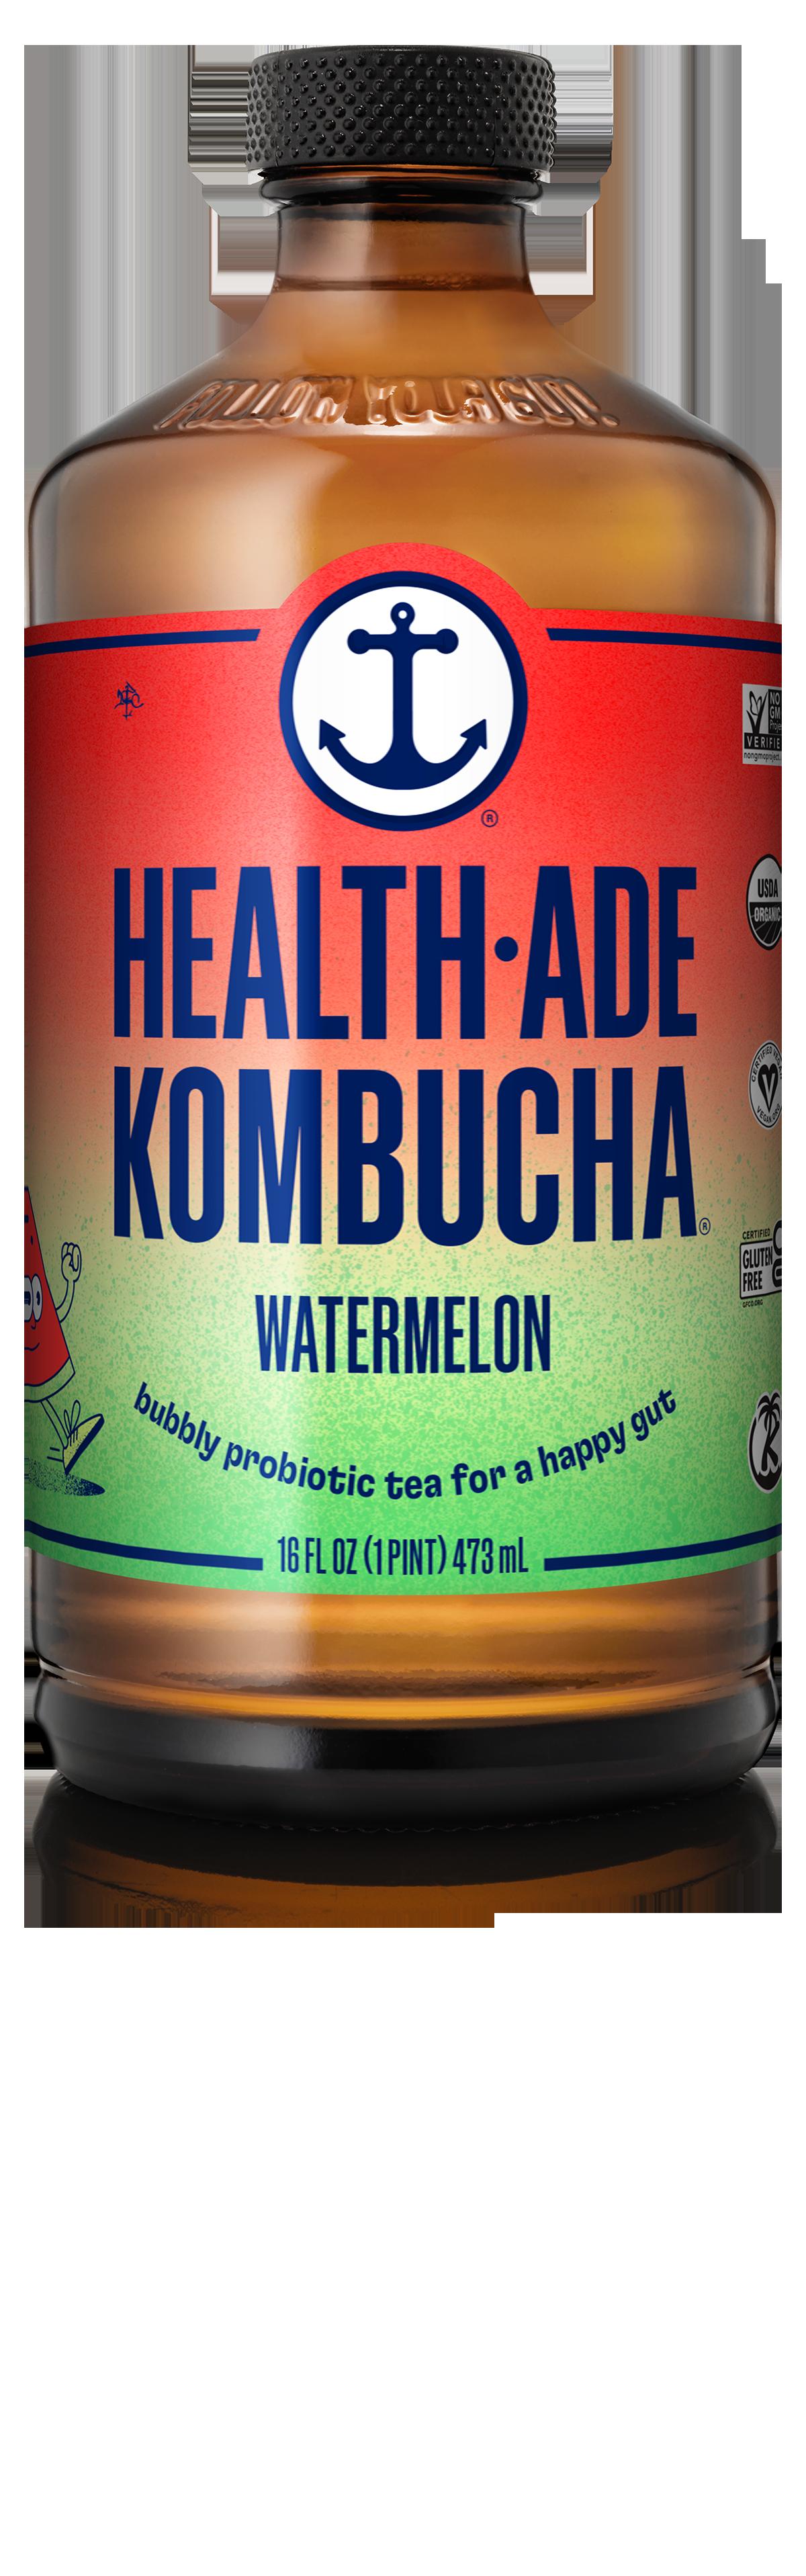 Health-Ade Kombucha Watermelon